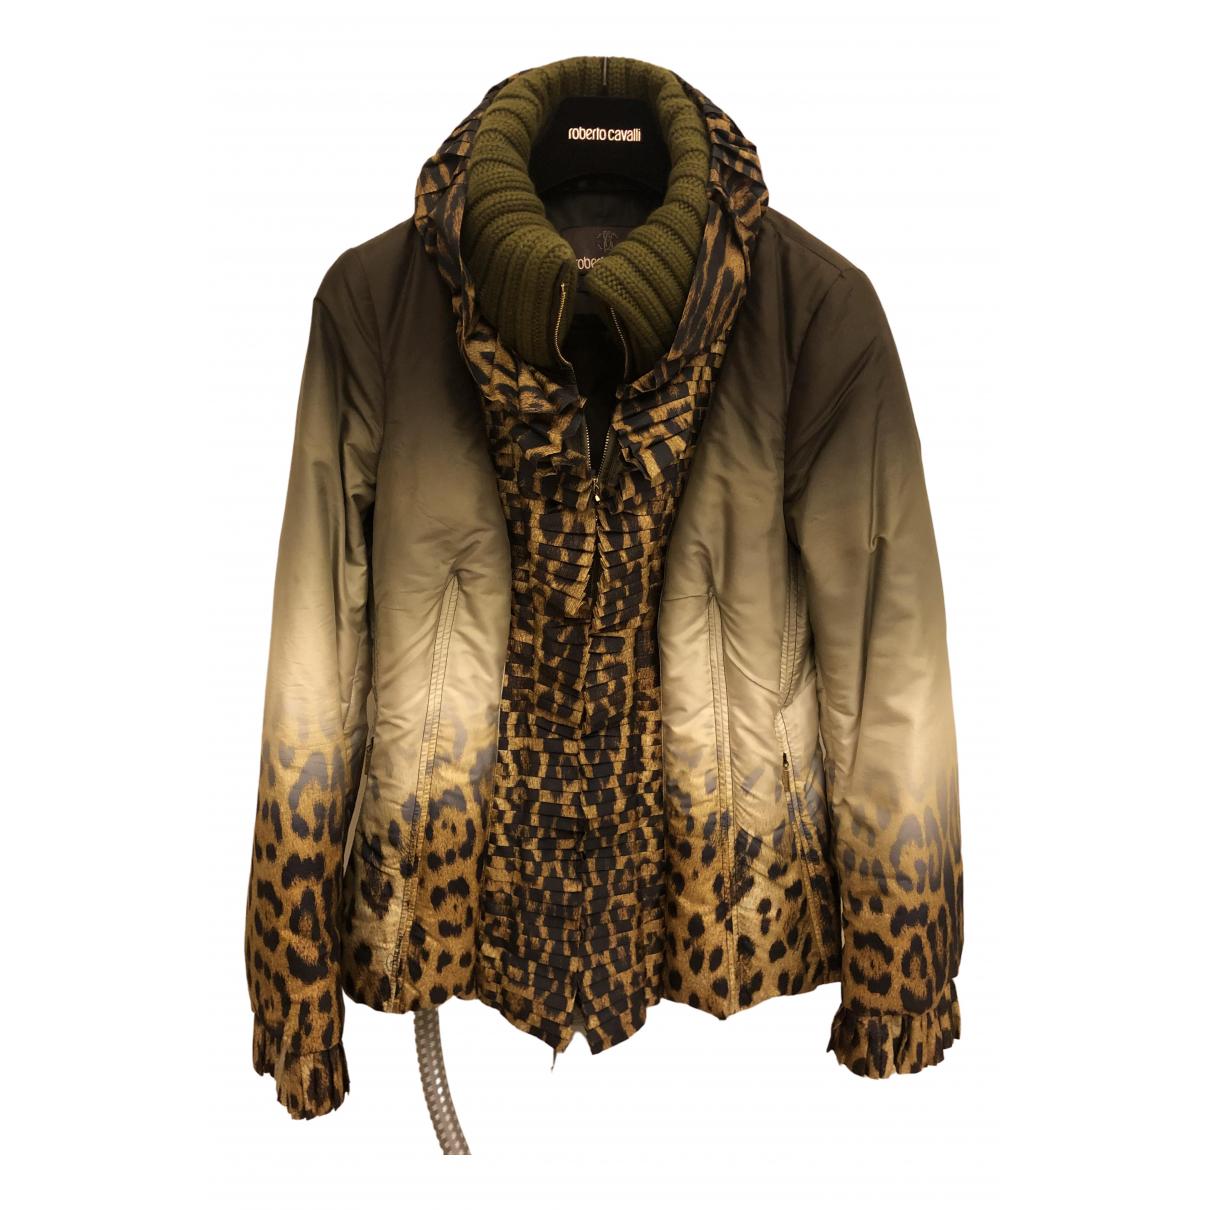 Roberto Cavalli \N Green Silk jacket for Women 42 IT